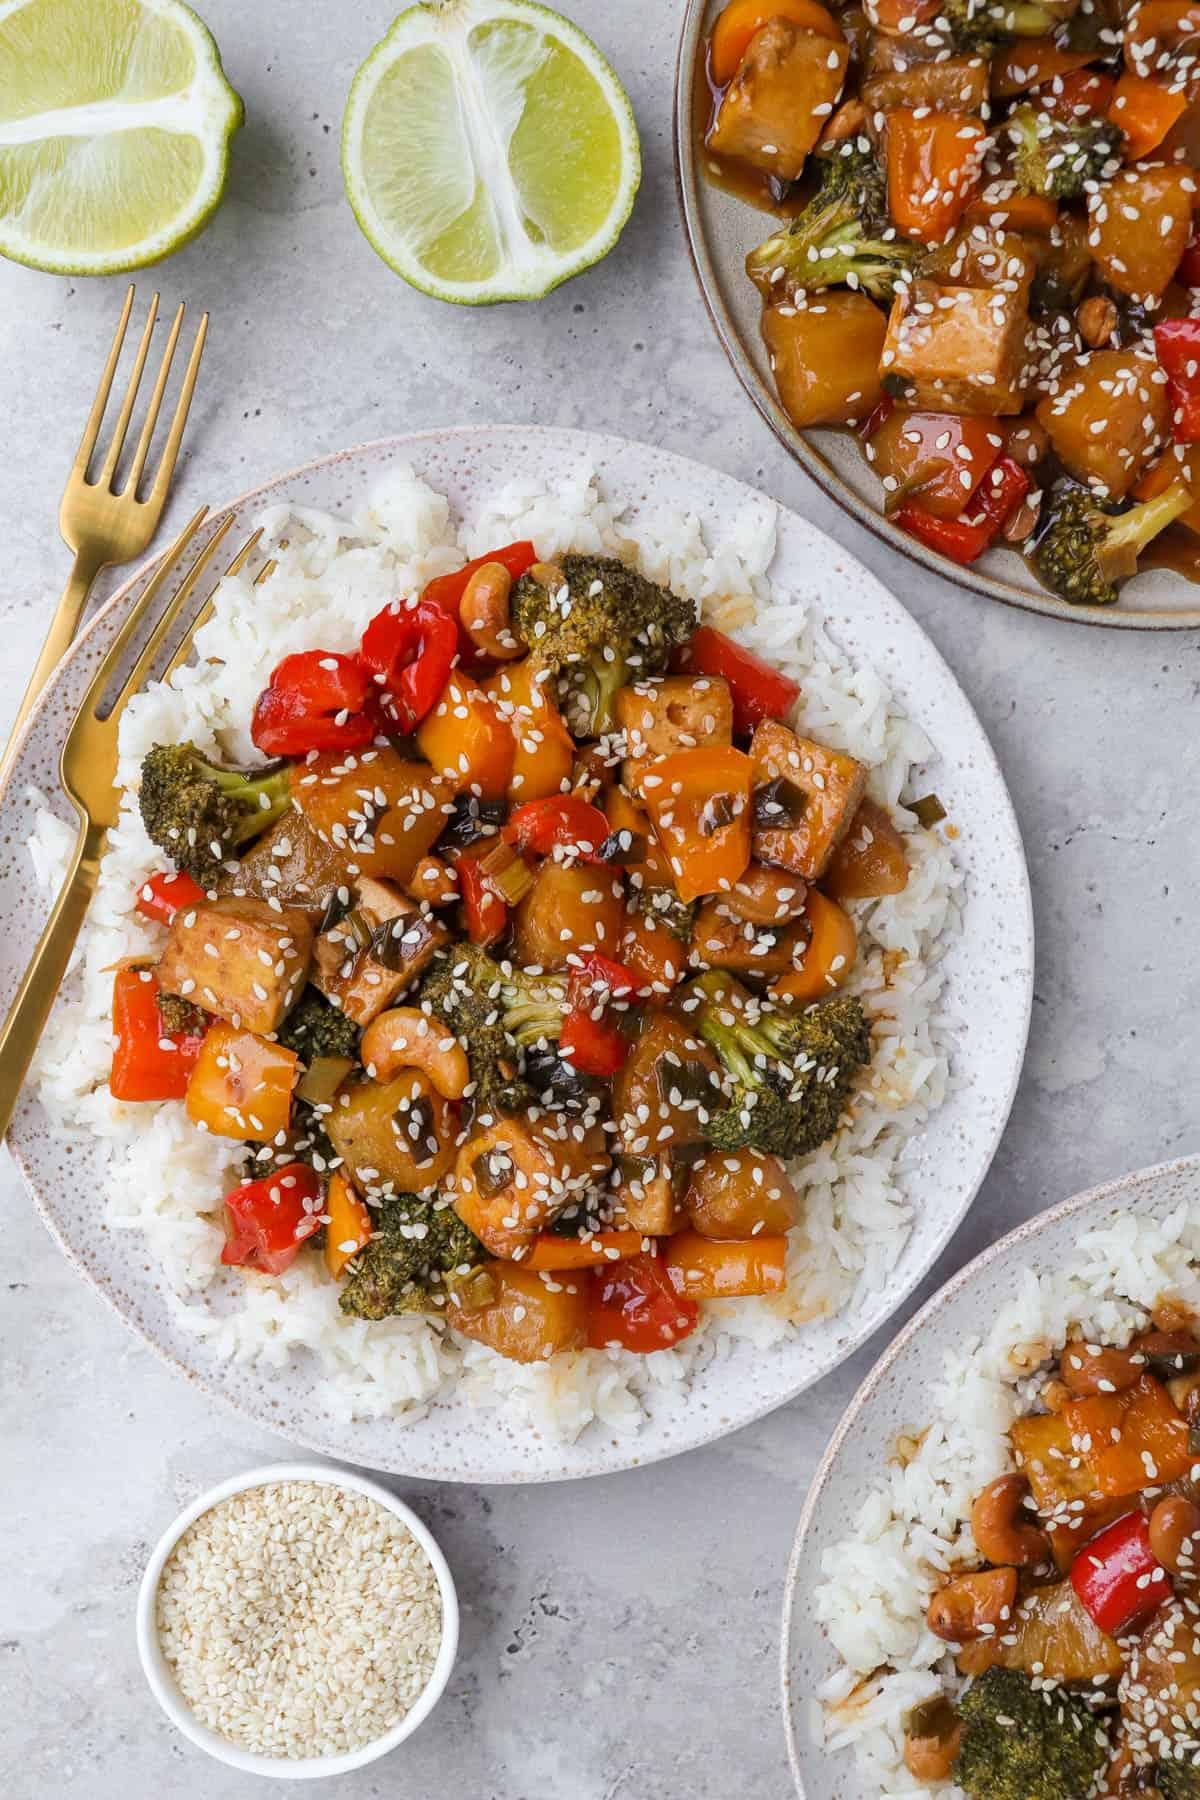 Pineapple tofu stir fry on three plates. Forks, limes and sesame seeds on sides.